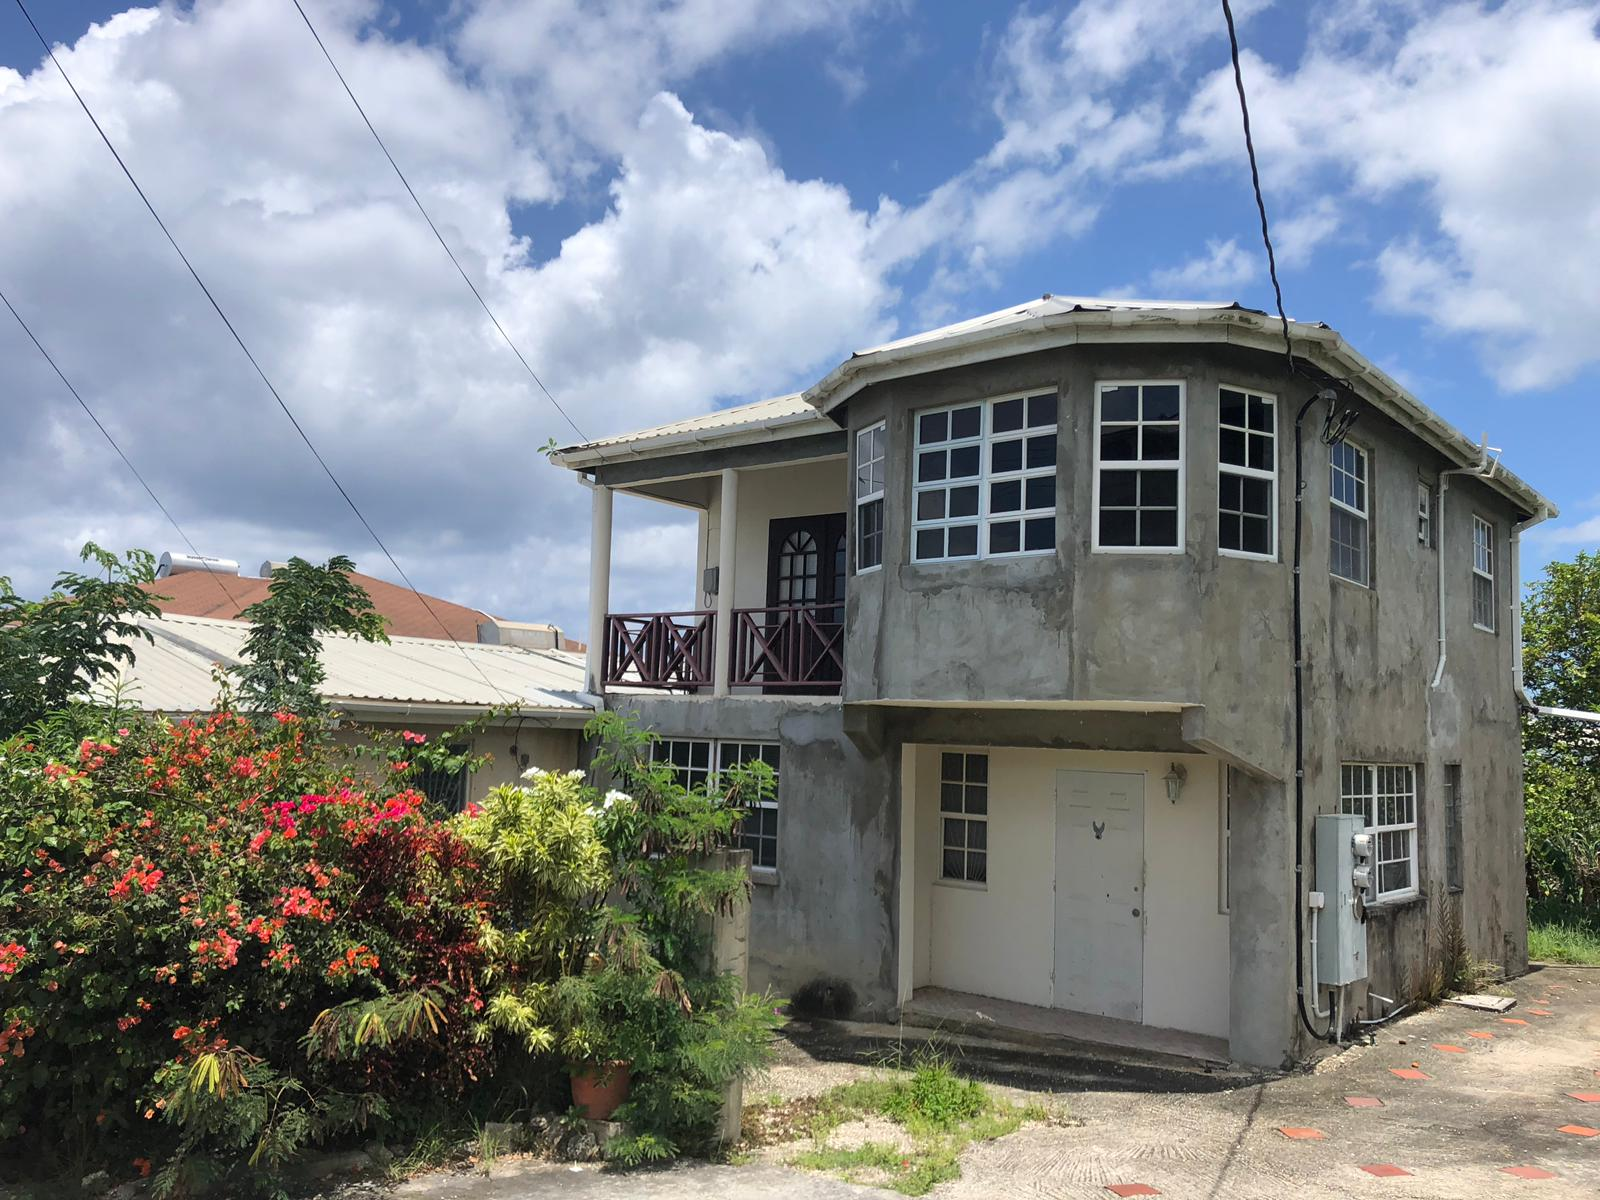 200 Bedroom, 20 Bathroom House in Husbands, St. James » Barbados Real ...